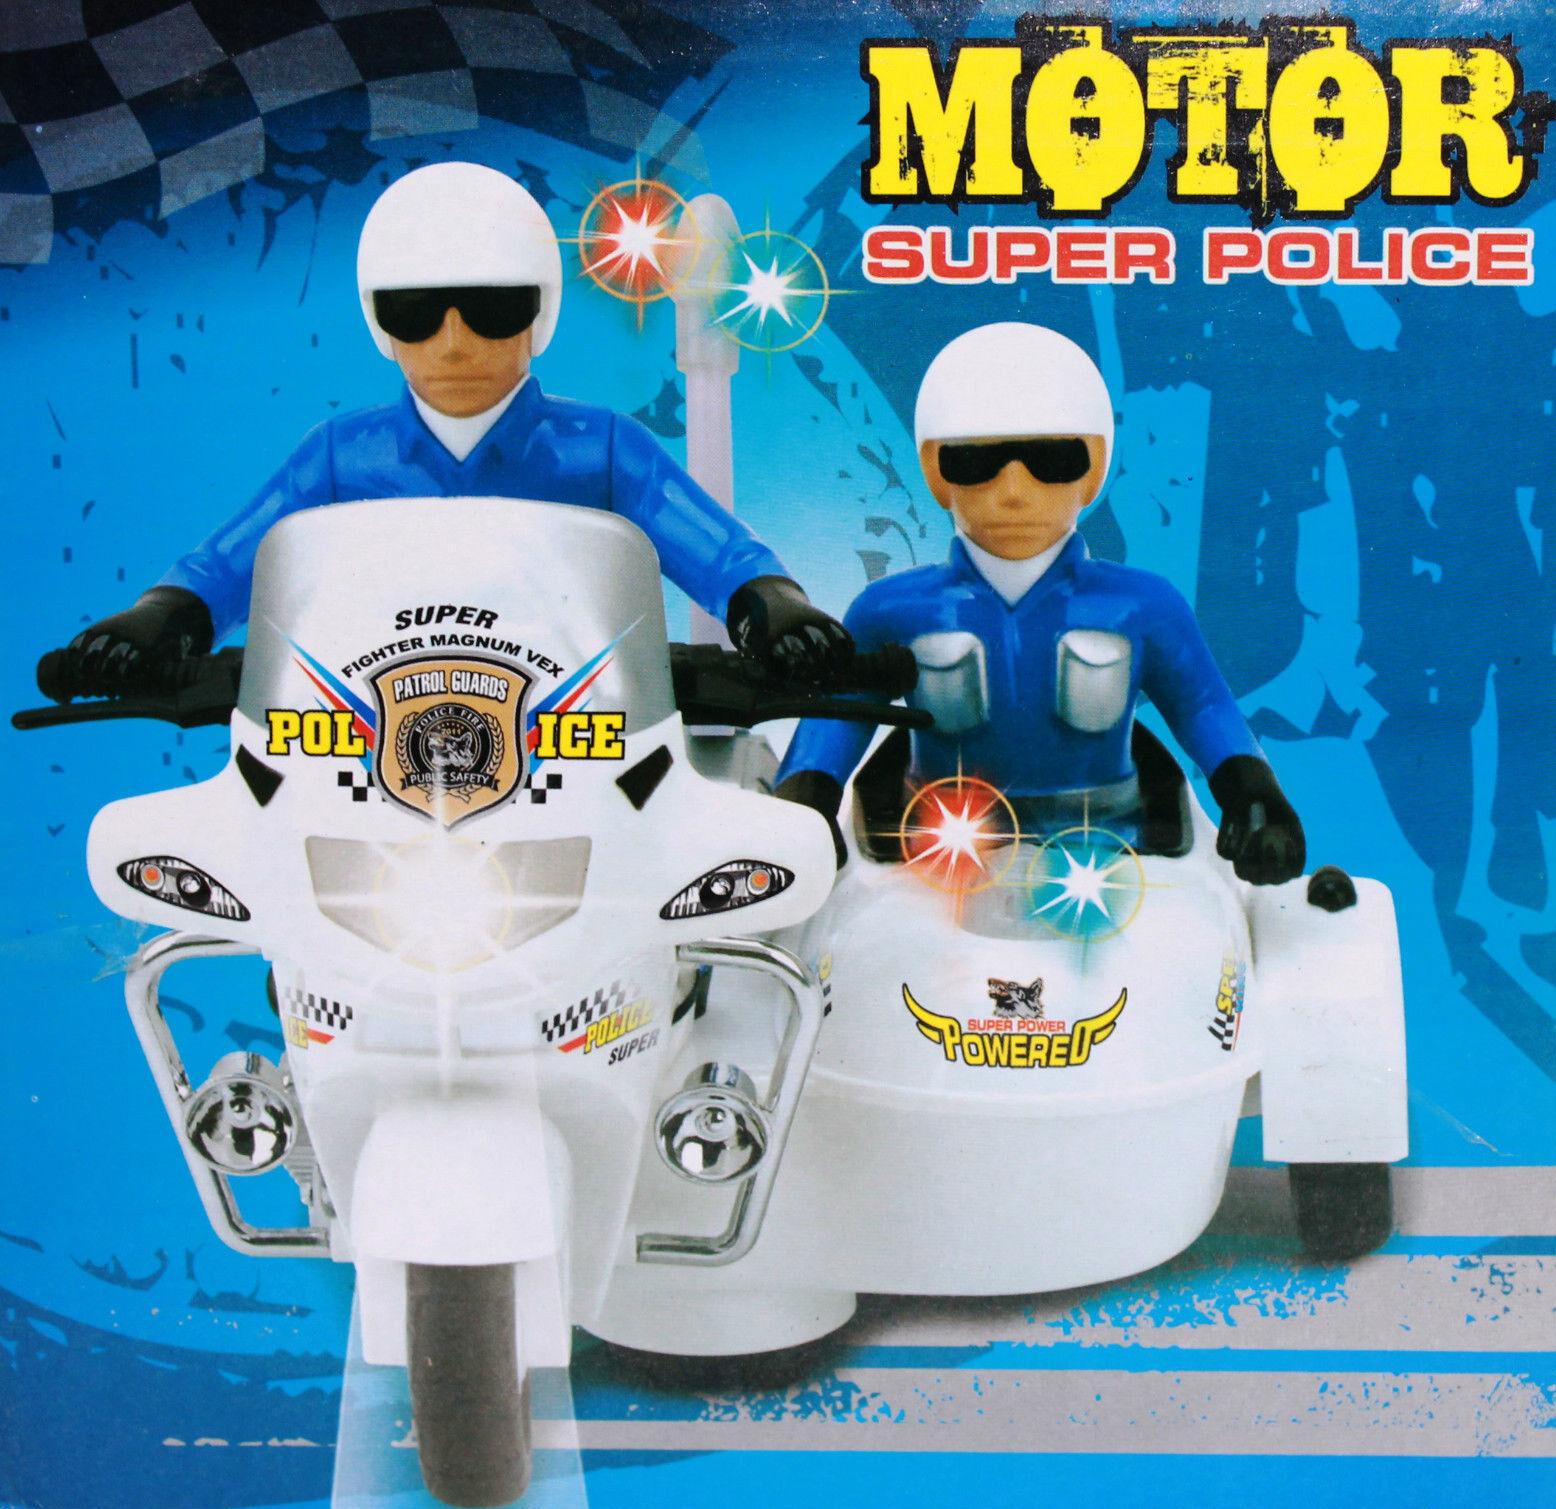 Bump Bump Bump et aller KIDS police moto scooter batterie exploité light & musique jouet acd4cf